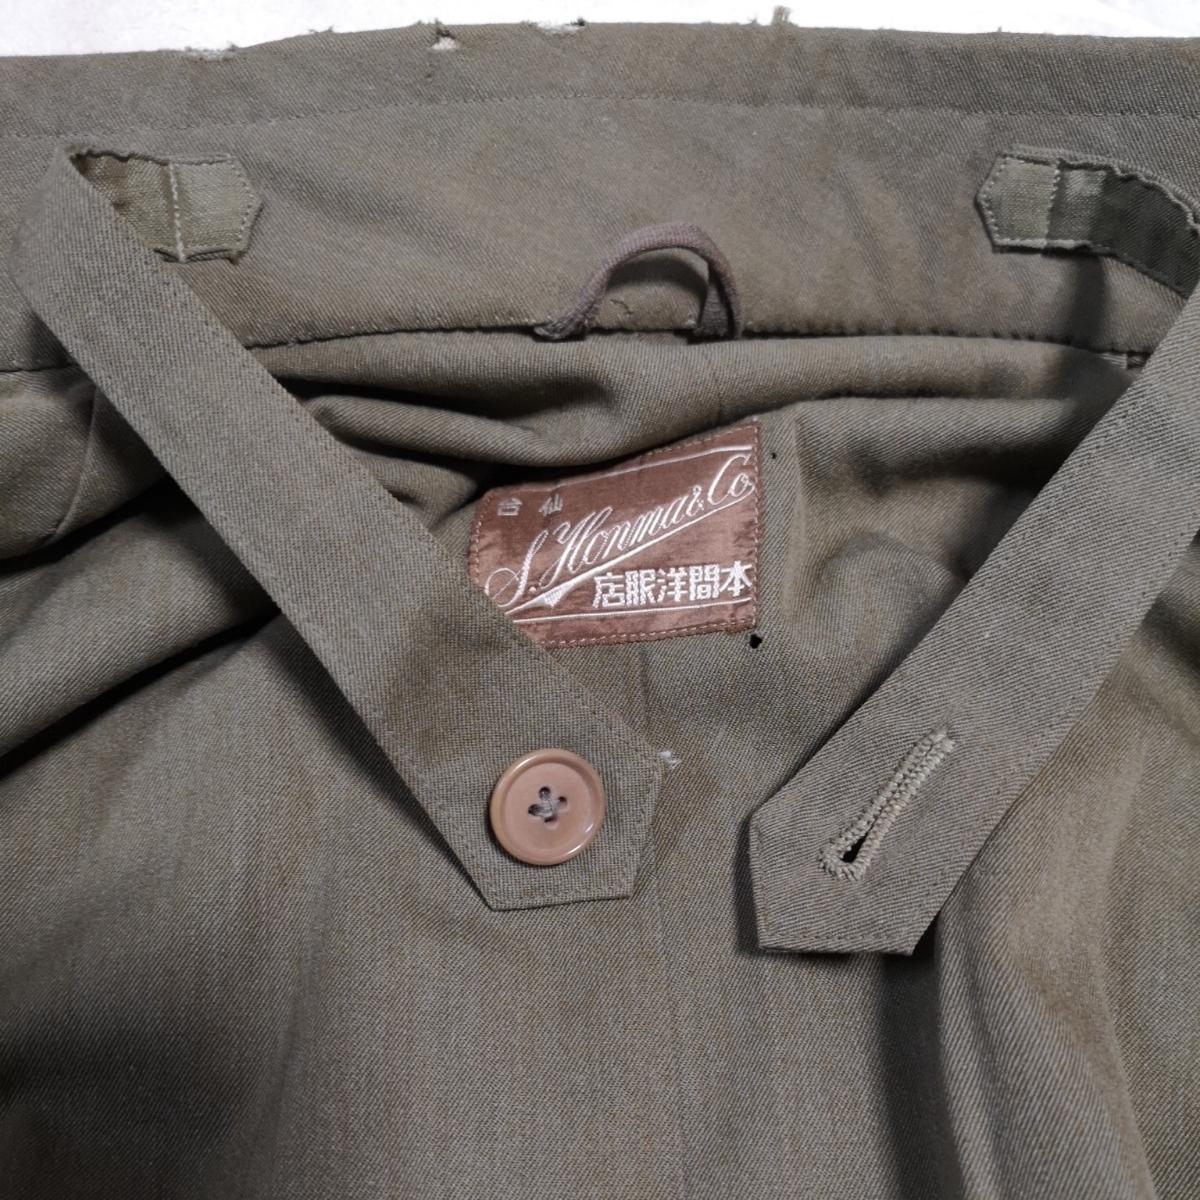 日本軍 将校マント 少尉 外套 襟章付き 戦前 洋品店仕立 軍服_画像7